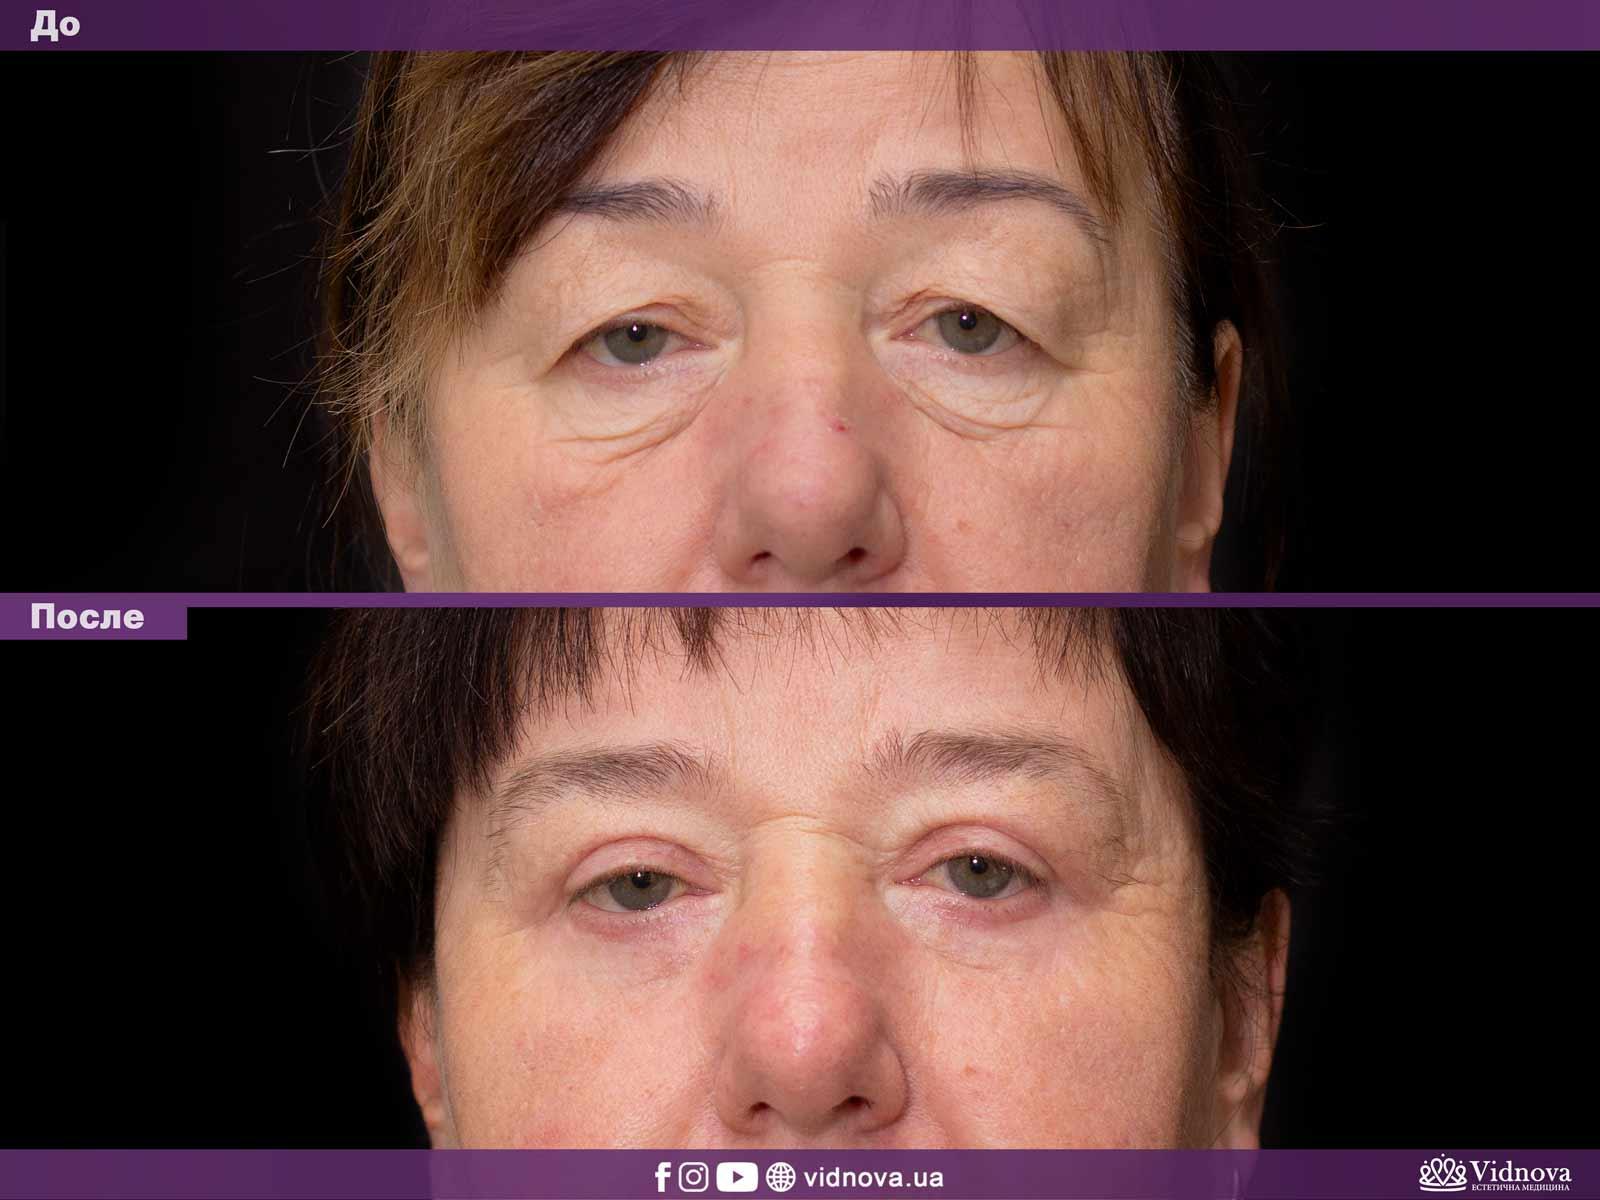 Блефаропластика: Фото До и После - Пример №28-1 - Клиника Vidnova